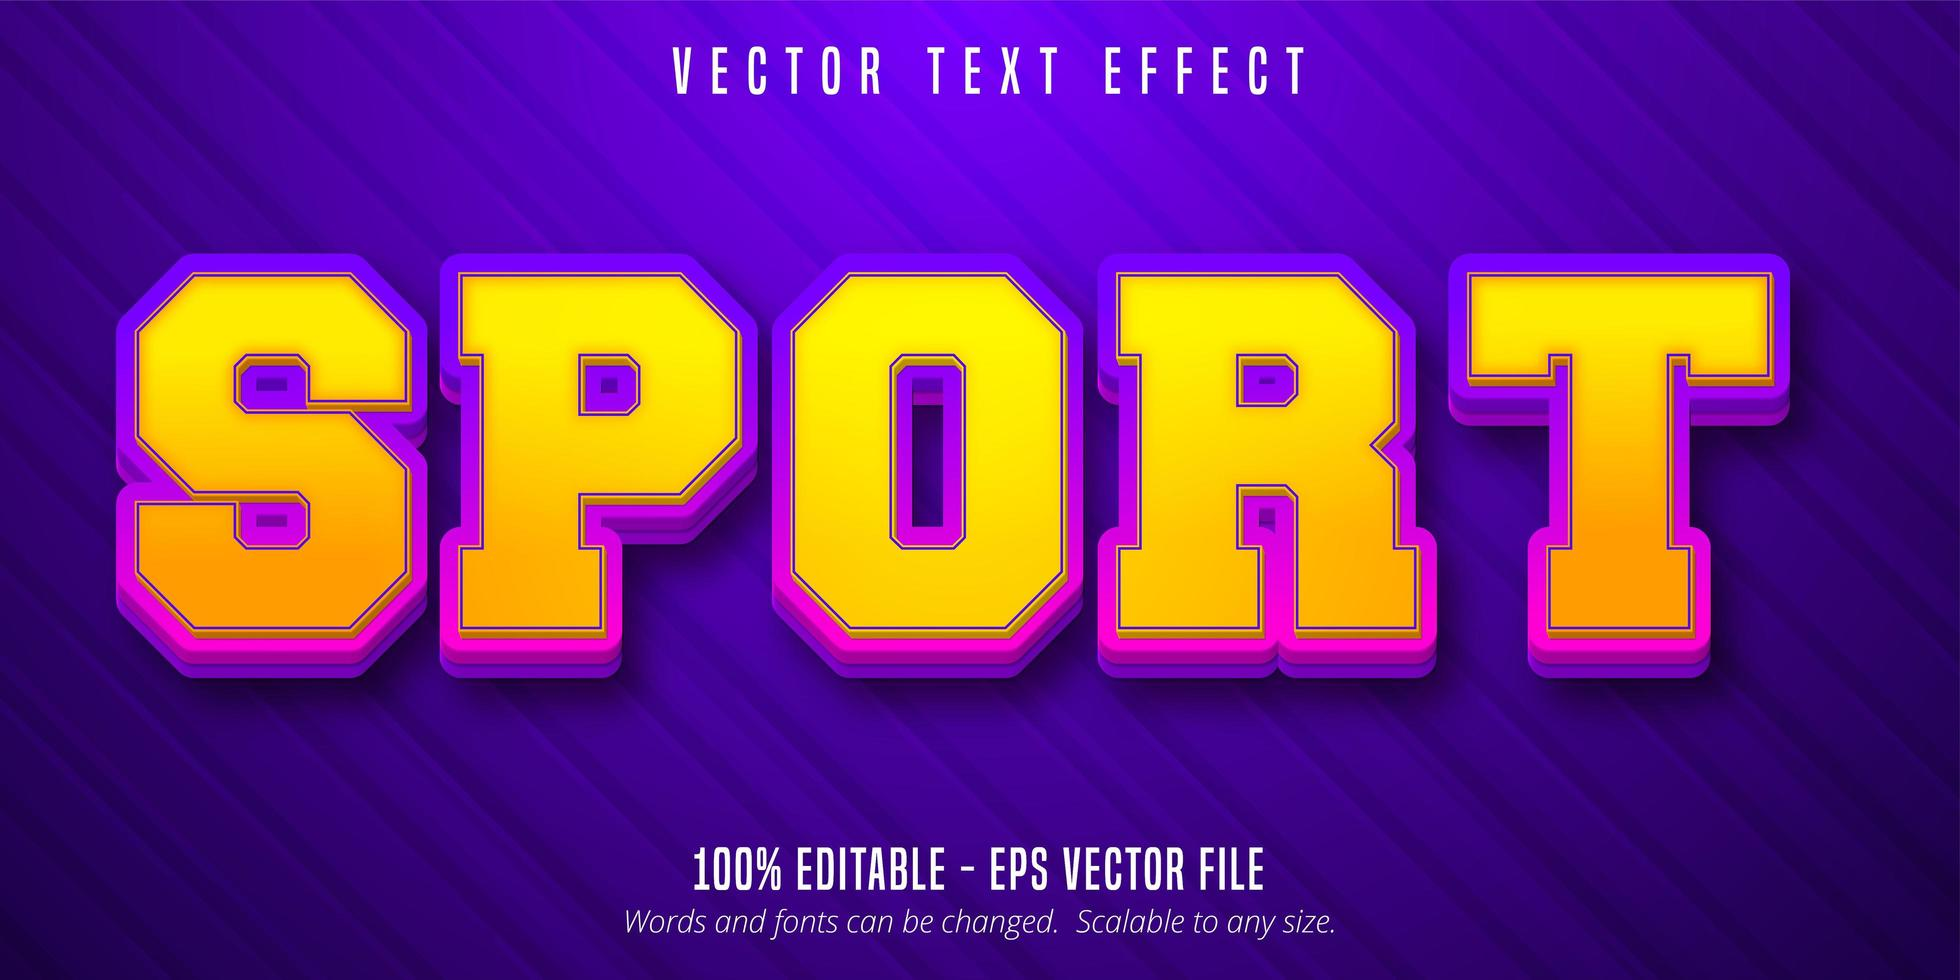 efecto de texto editable de estilo deportivo vector